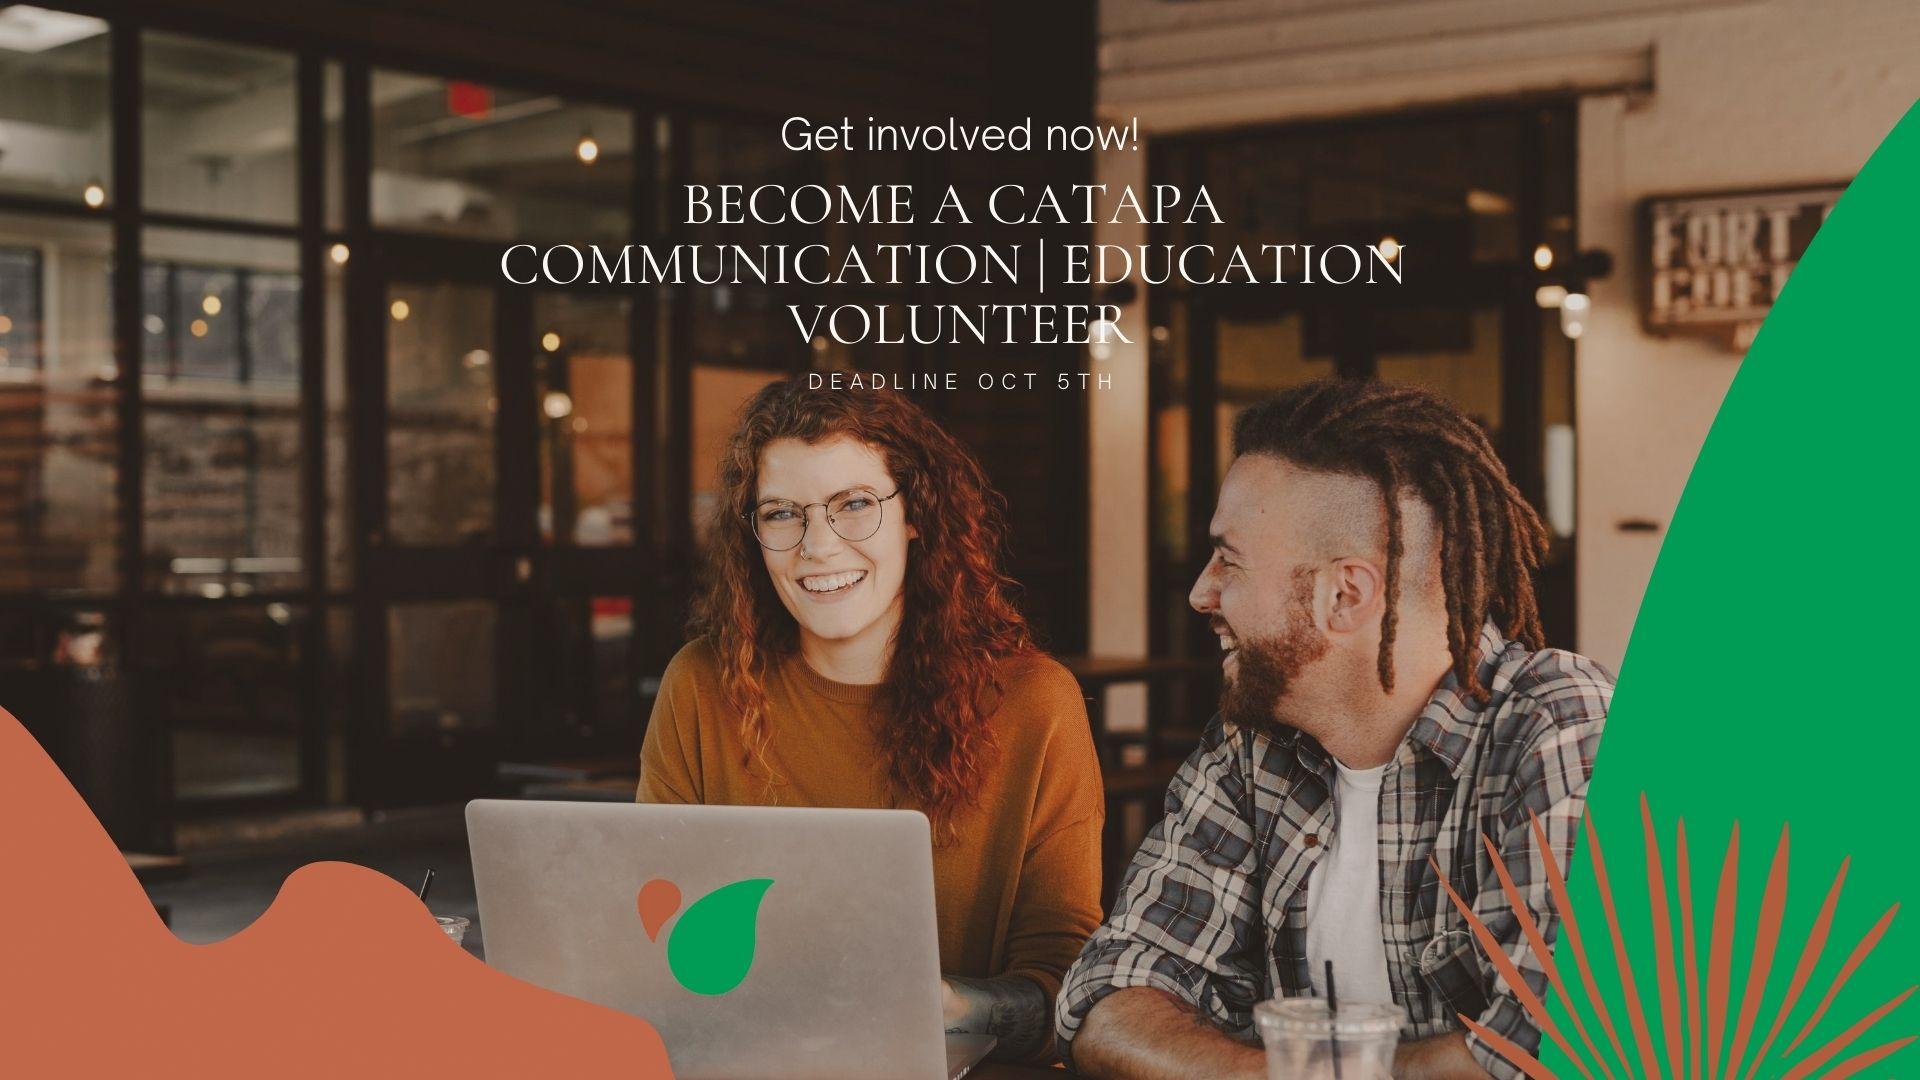 Catapa communication education volunteer